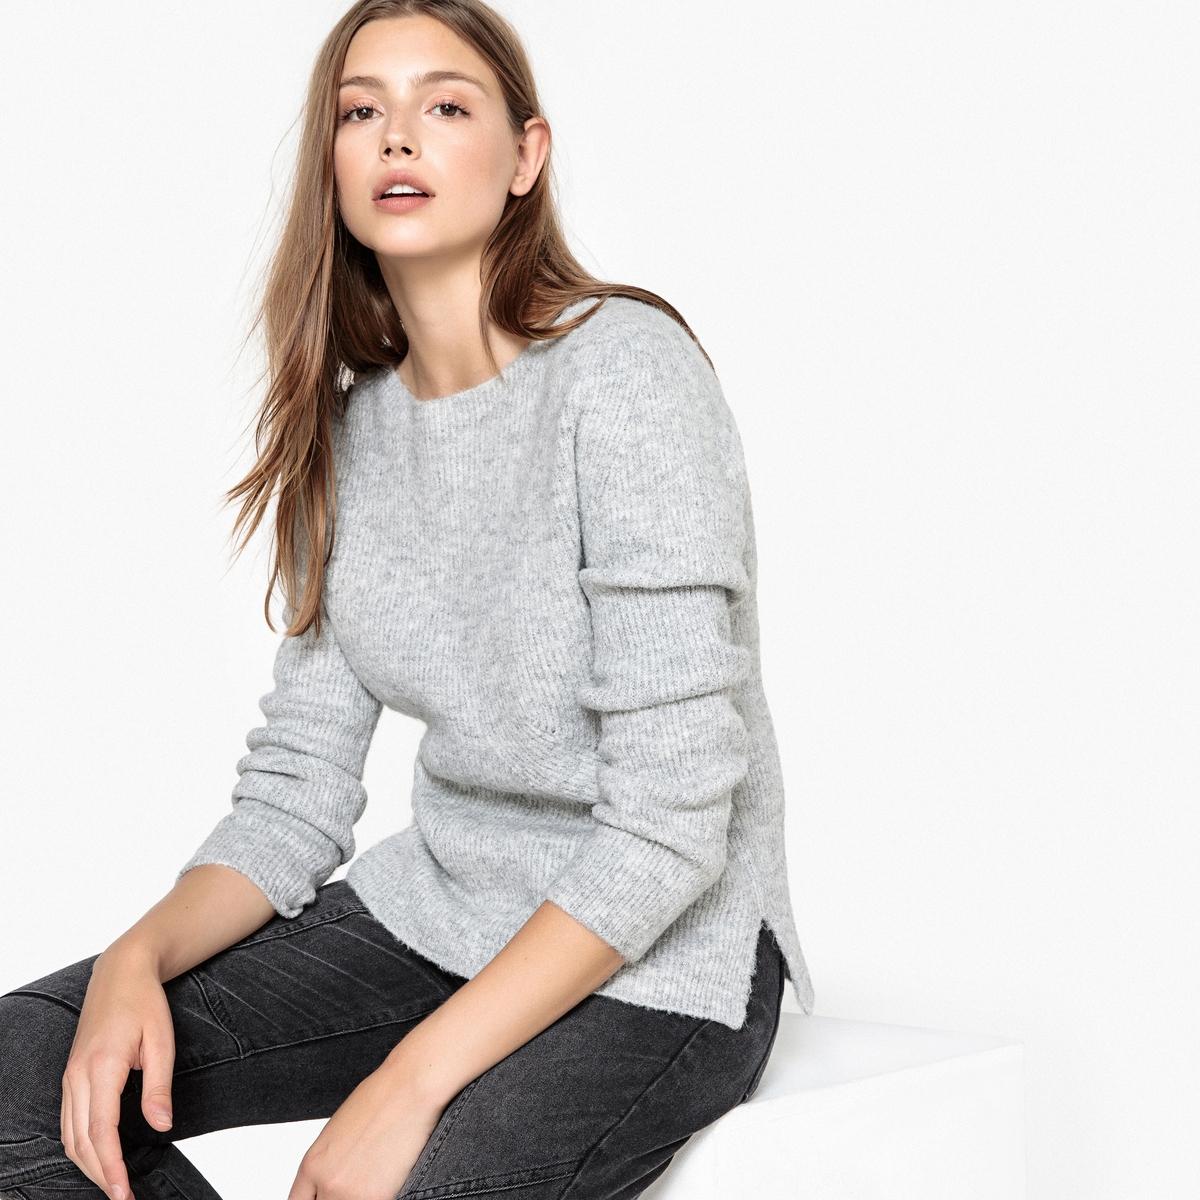 Пуловер с вырезом-лодочкой из плотного трикотажа MAKAYNE цены онлайн